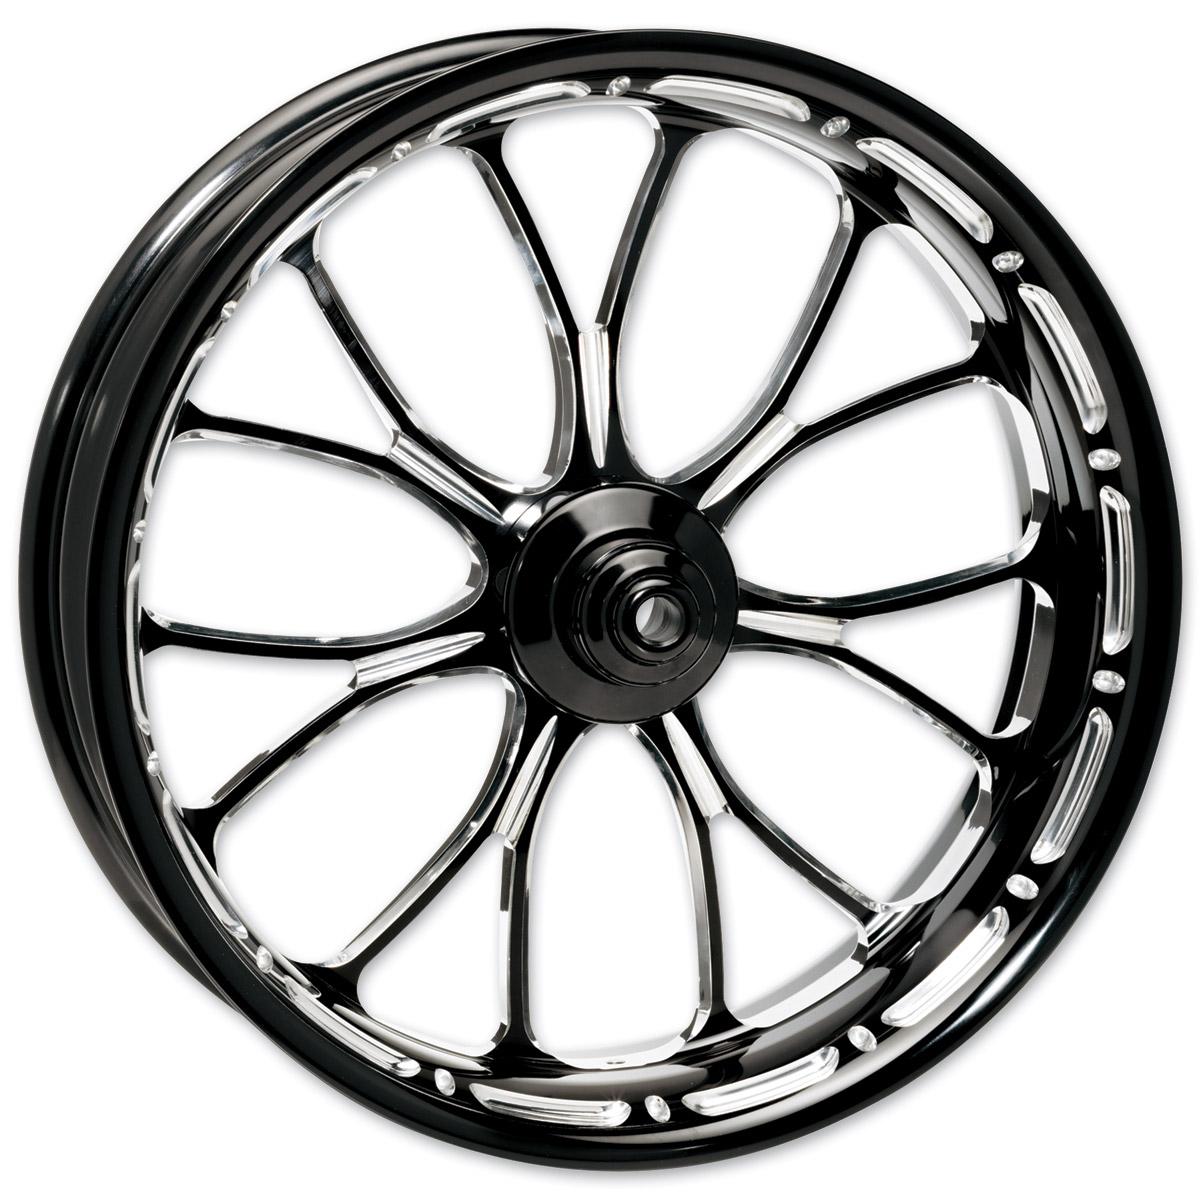 Performance Machine Contrast Cut Platinum Forged Heathen Rear Wheel, 16